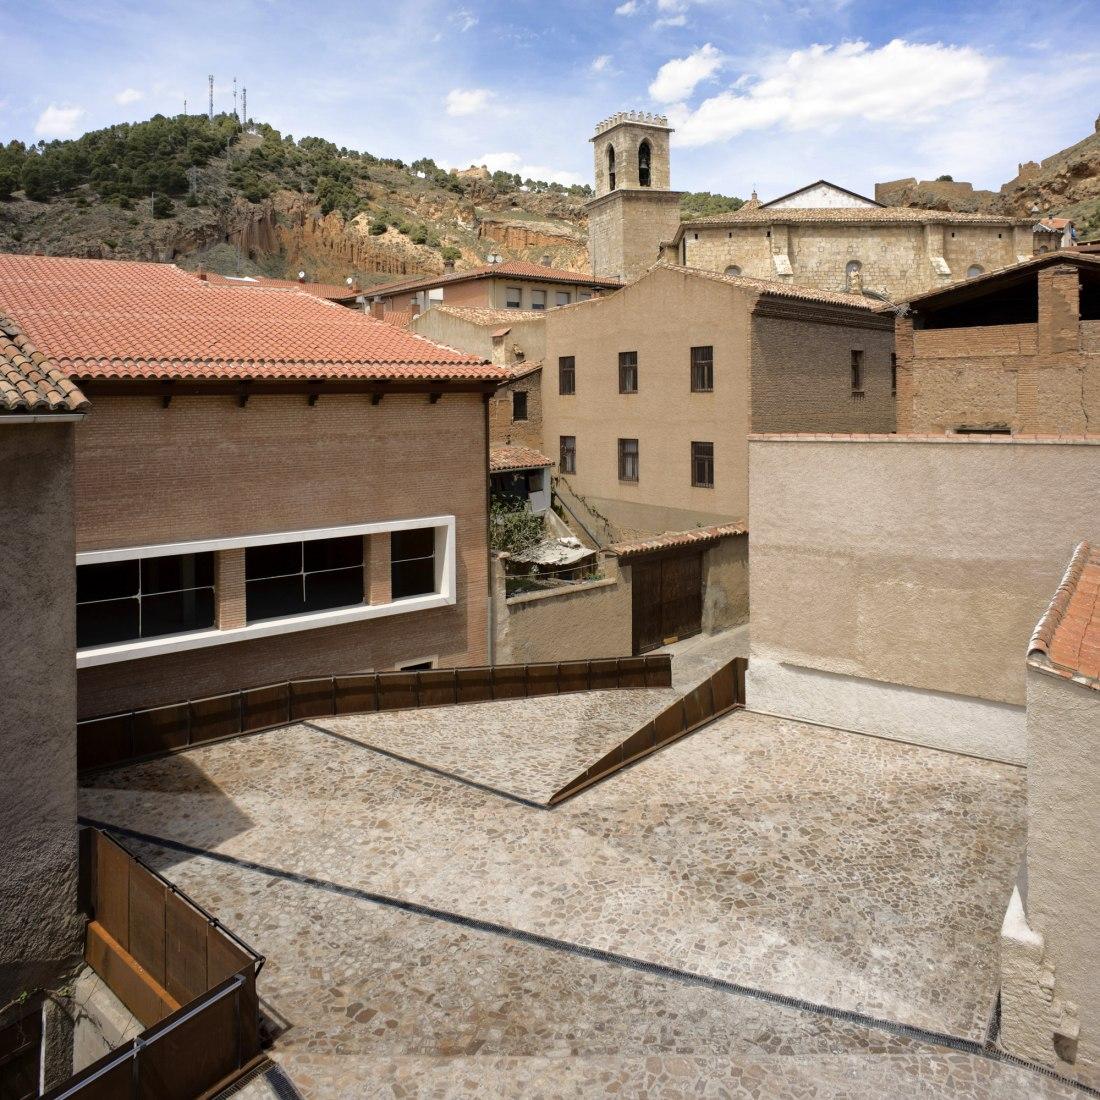 Outside vision. Archaeological space in Daroca by Sergio Sebastian. Photograph © Gabriel López.